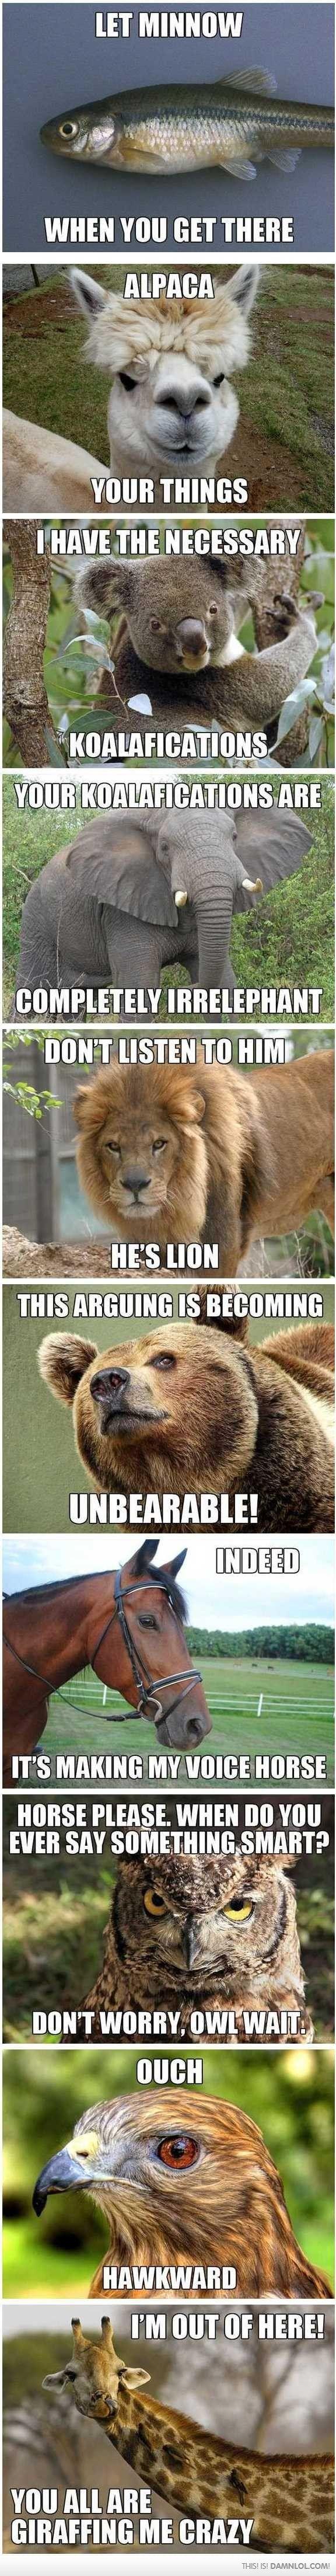 hehehe: Animal Jokes, Animal Humor, Funny Stuff, Love Puns, Animal Puns, Funny Animal, So Funny, Funny Puns, Animal Memes